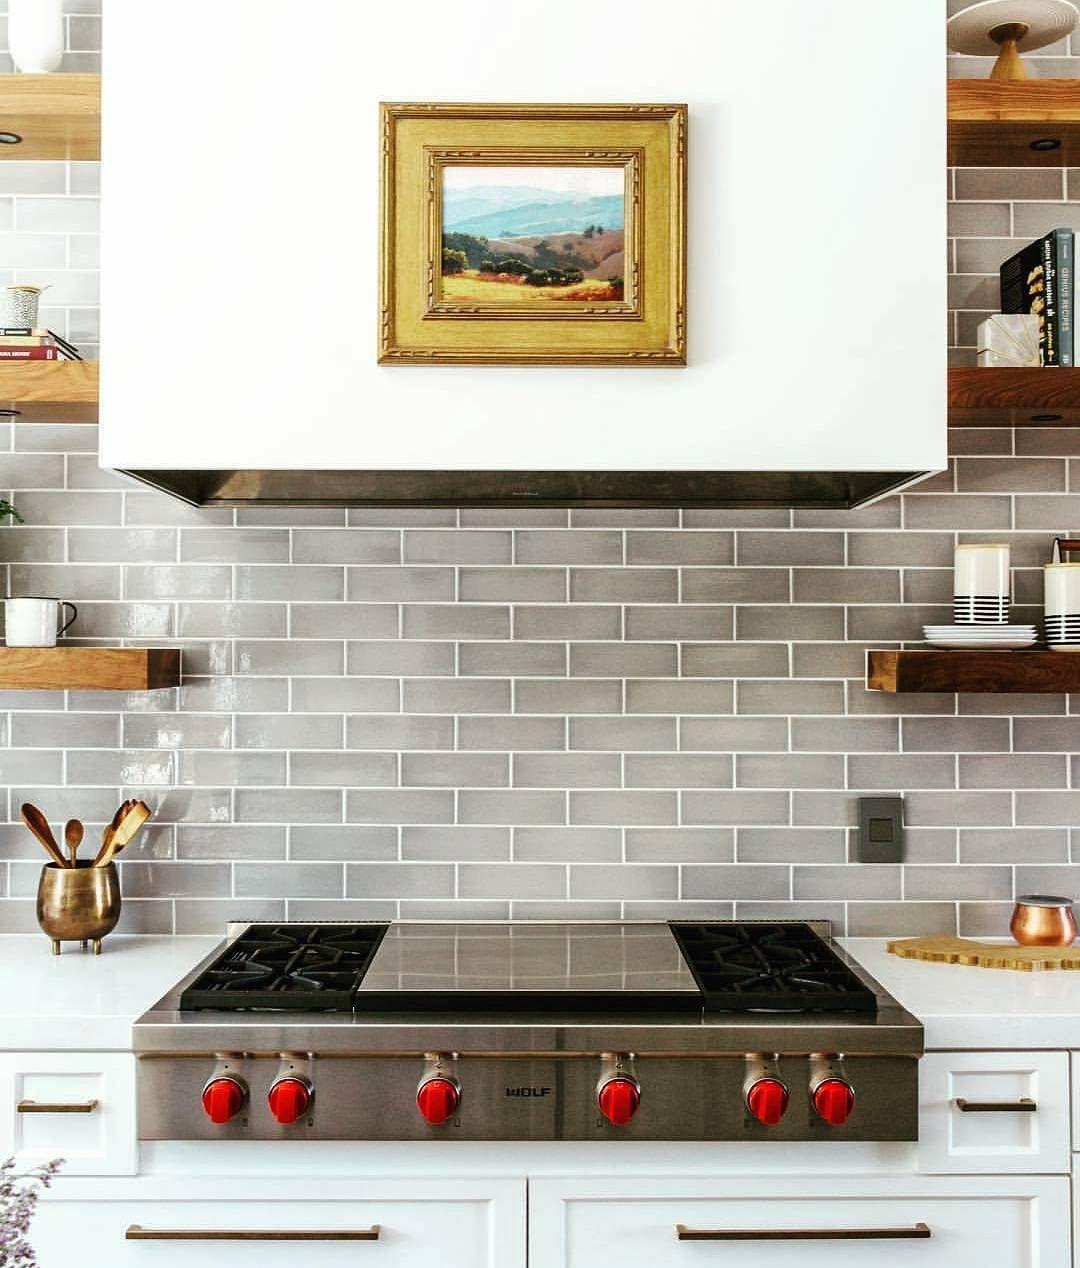 interior design hospitality design industry tips kitchen rh pinterest com